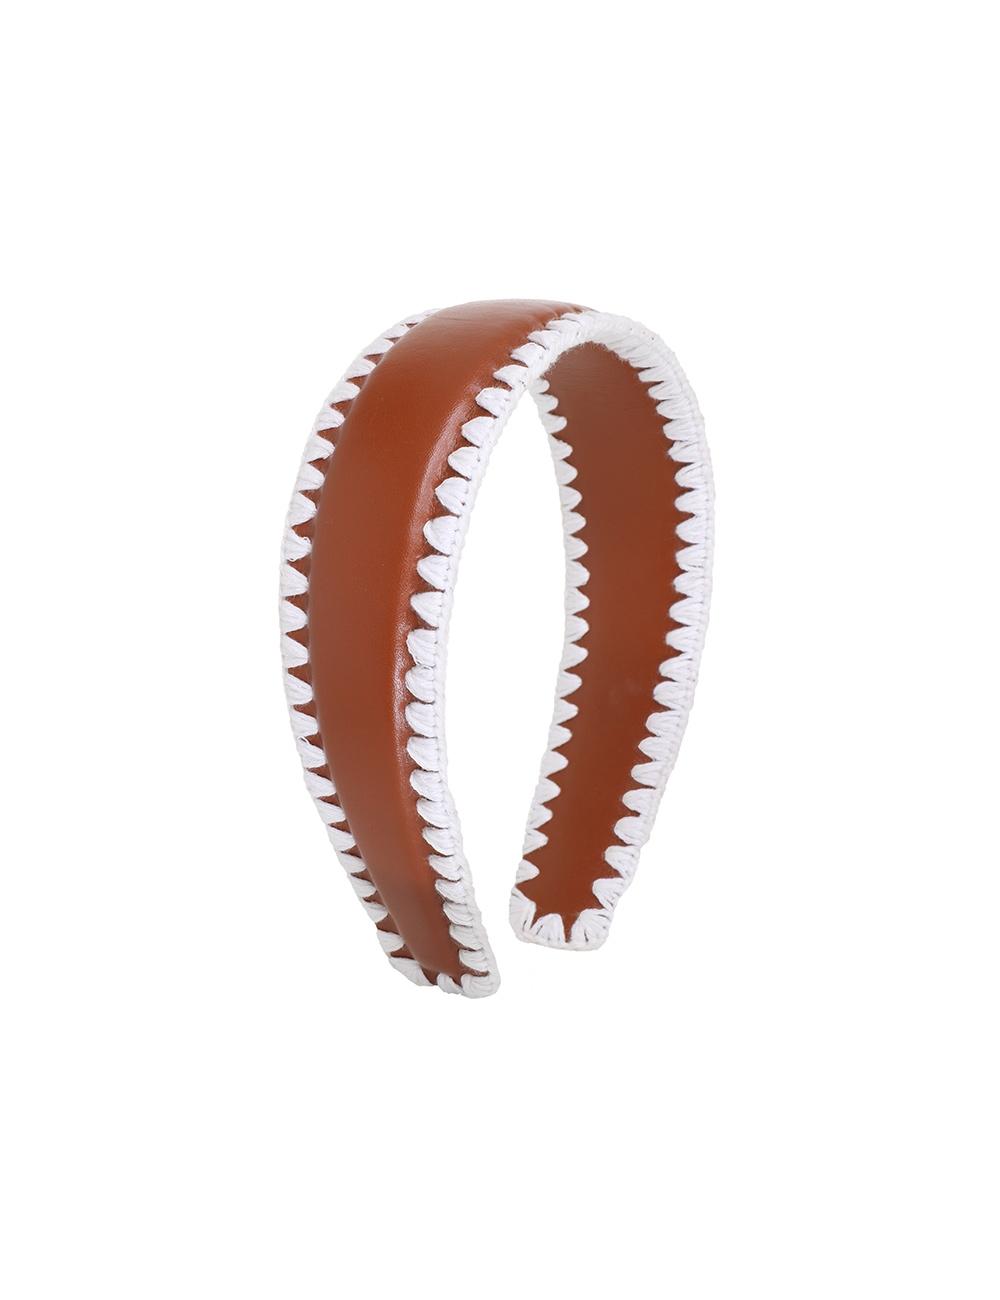 Ric Rac Leather Headband